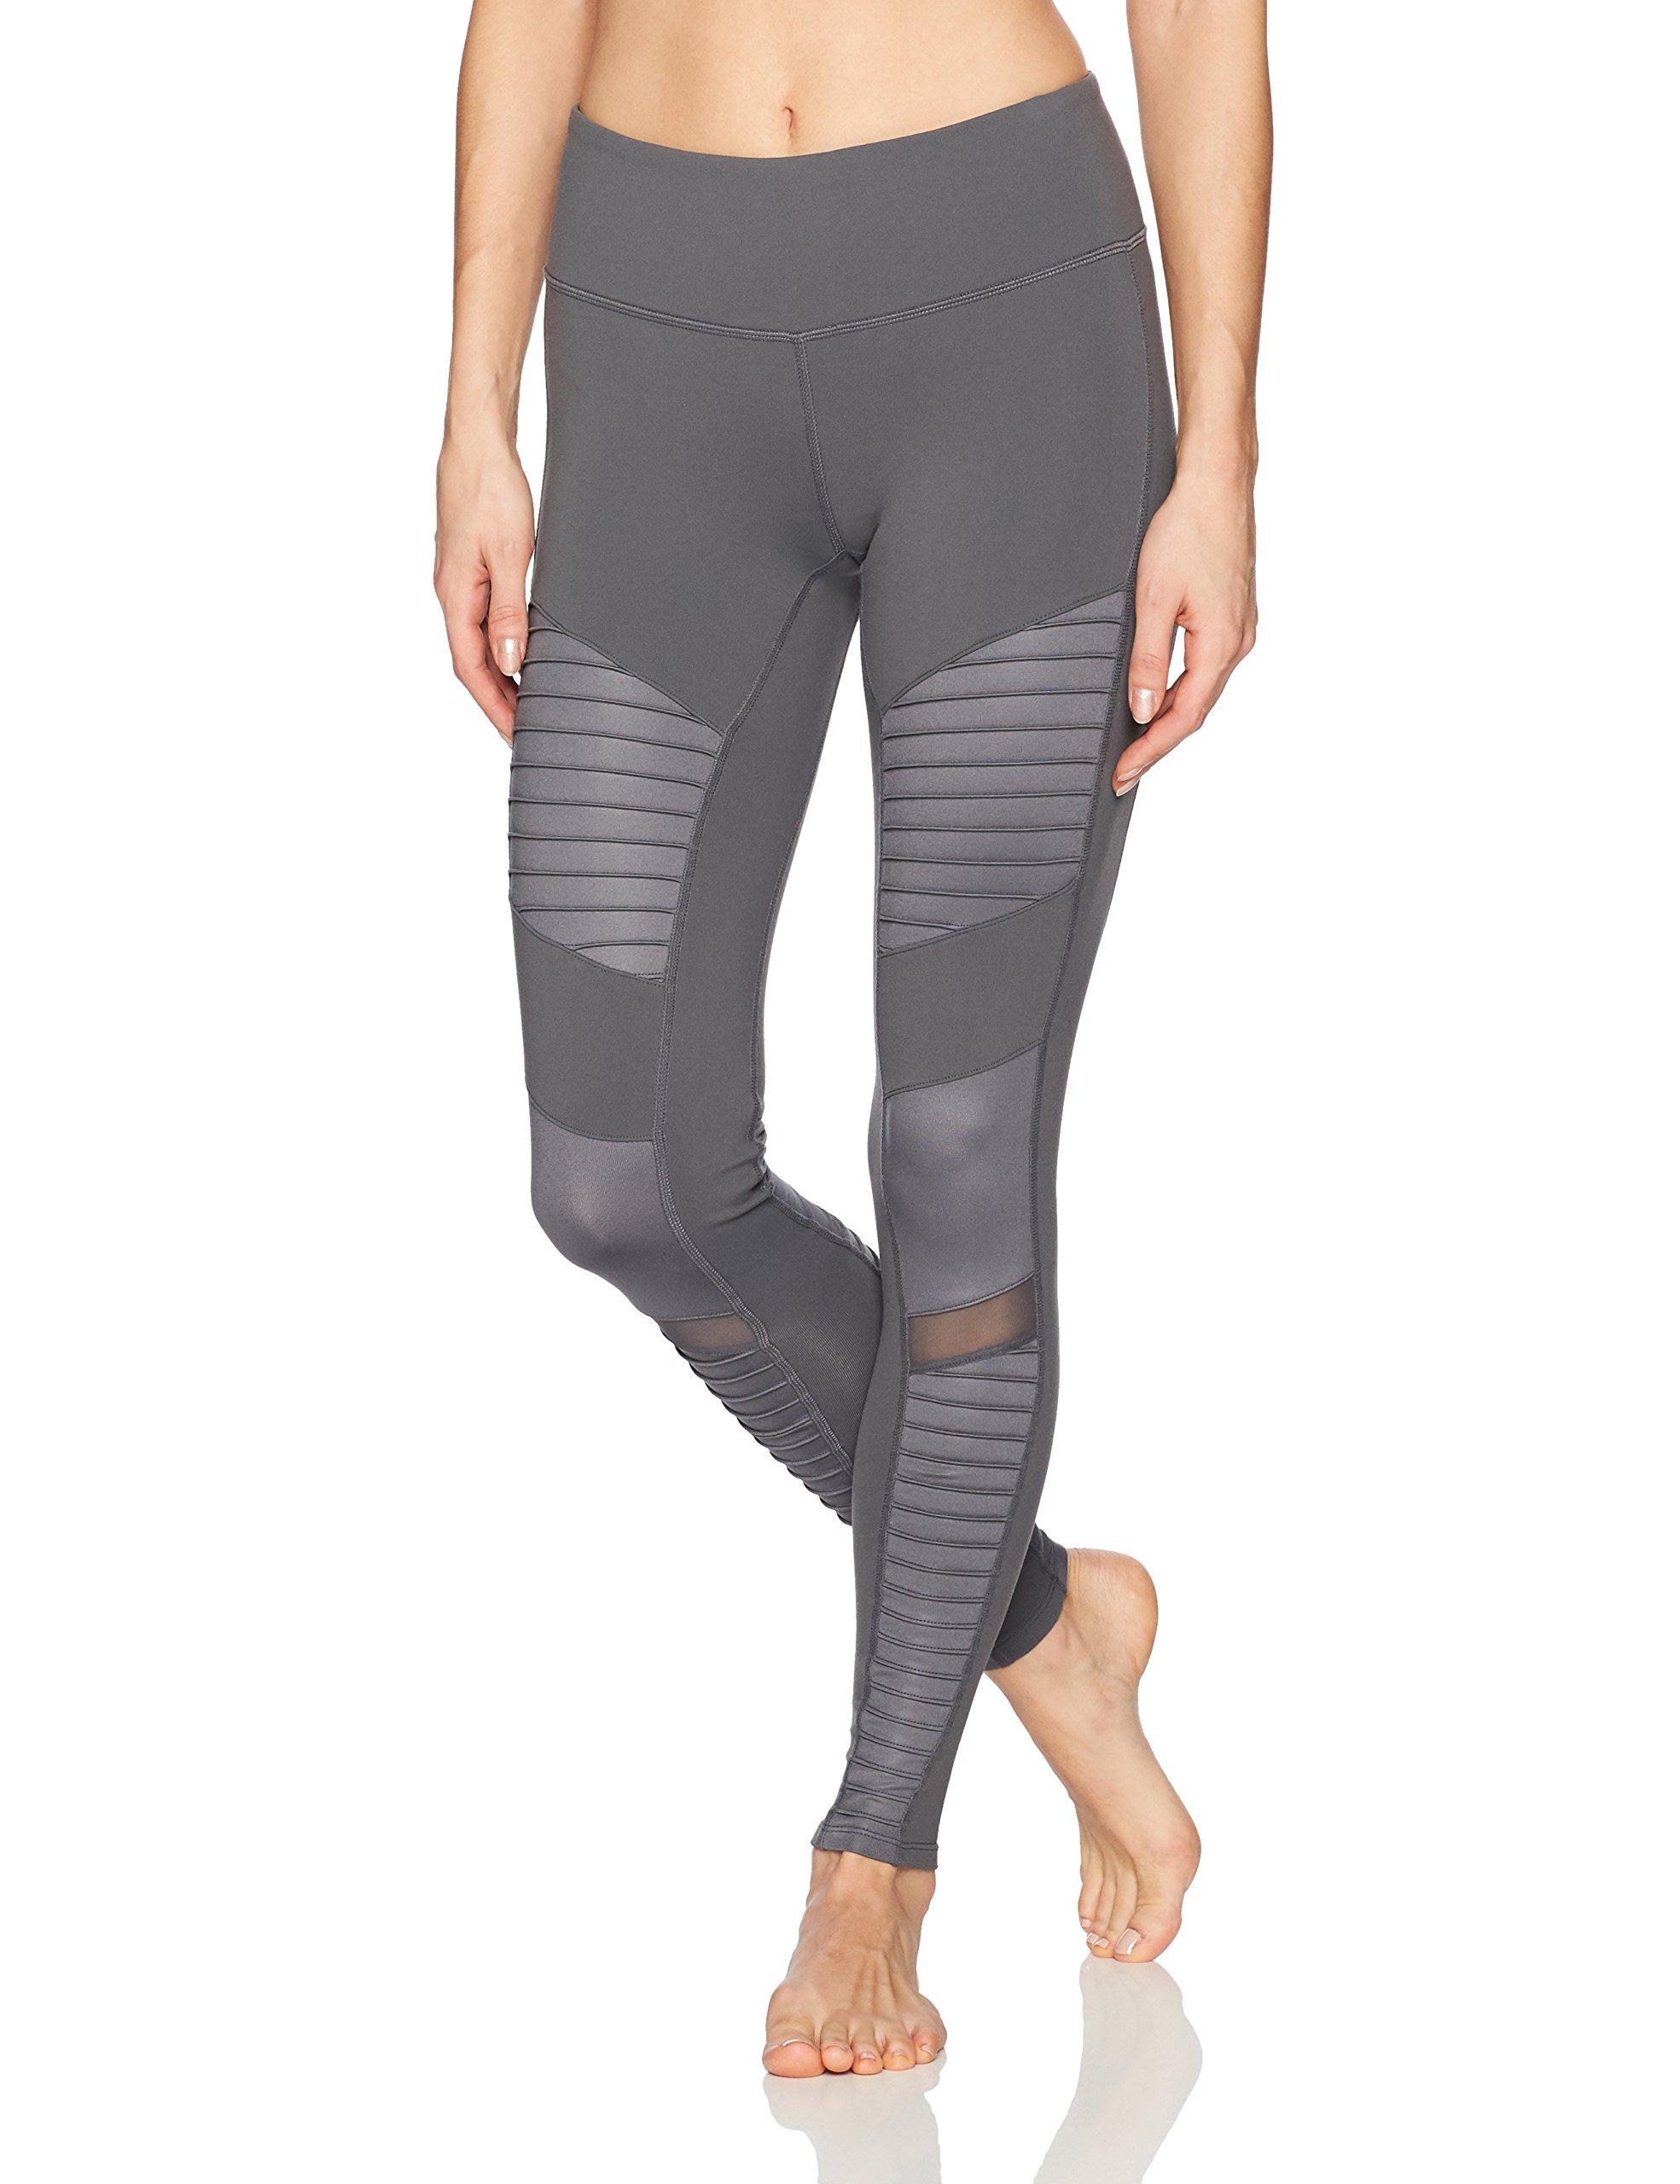 Alo Yoga Women's Moto Legging, Slate/Slate Glossy, M